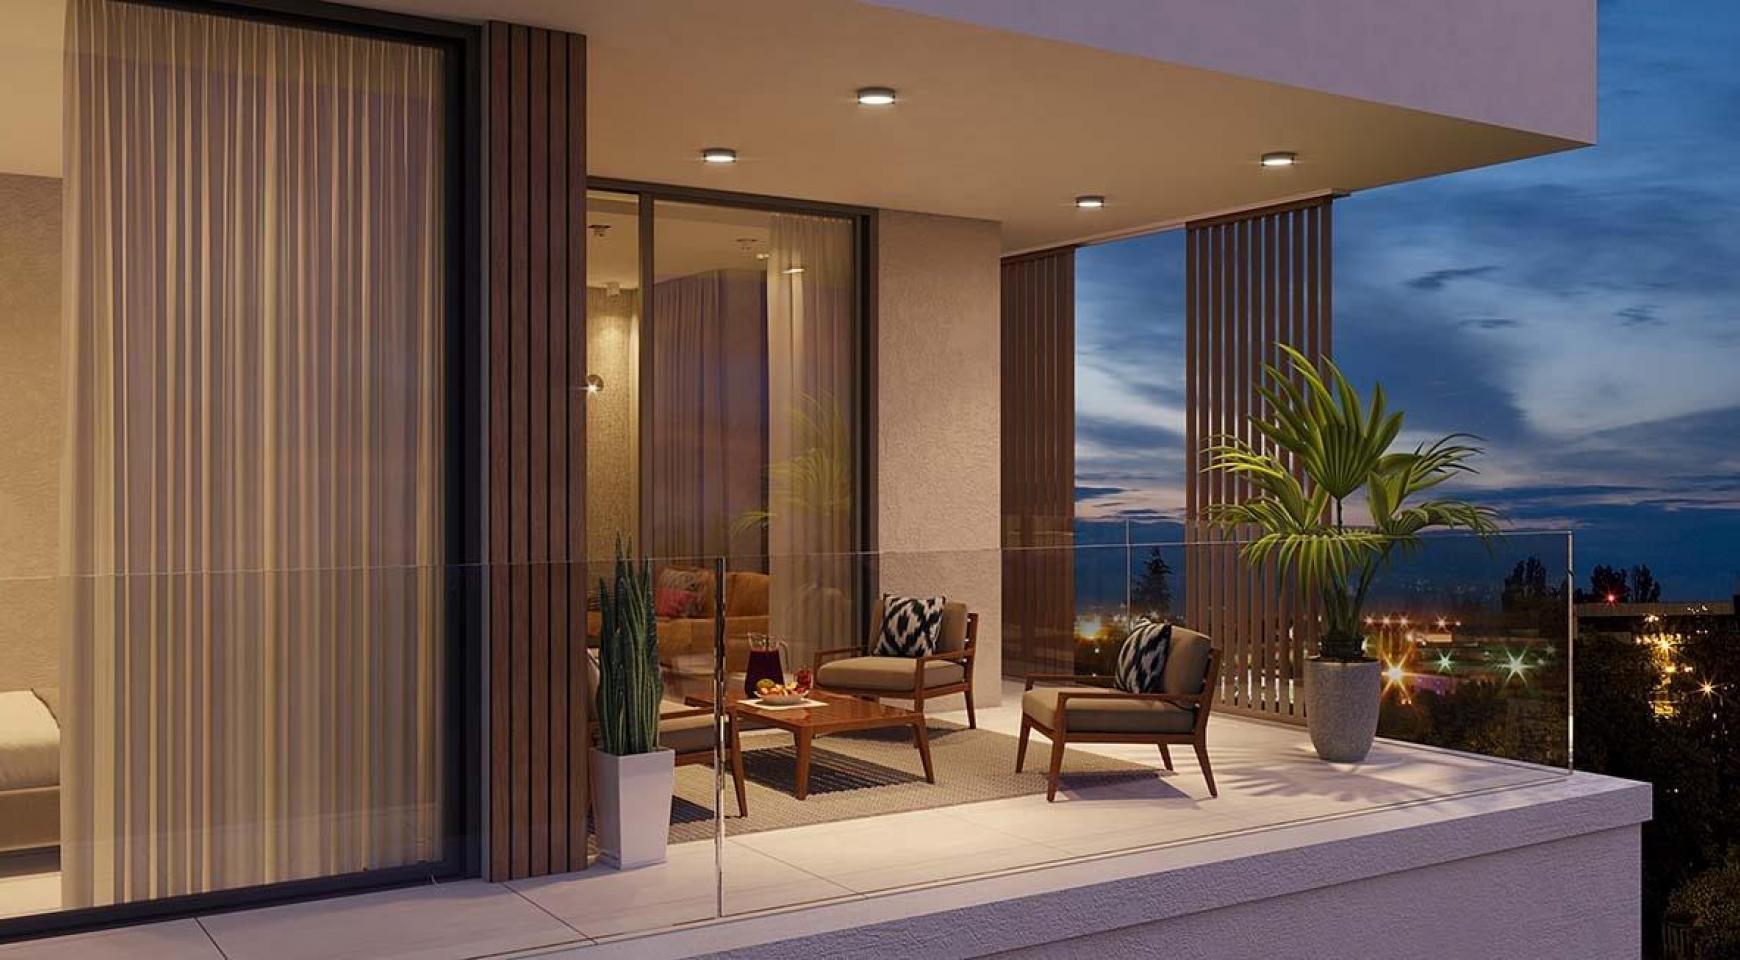 Contemporary 3 Bedroom Apartment in a New Complex near the Sea - 8